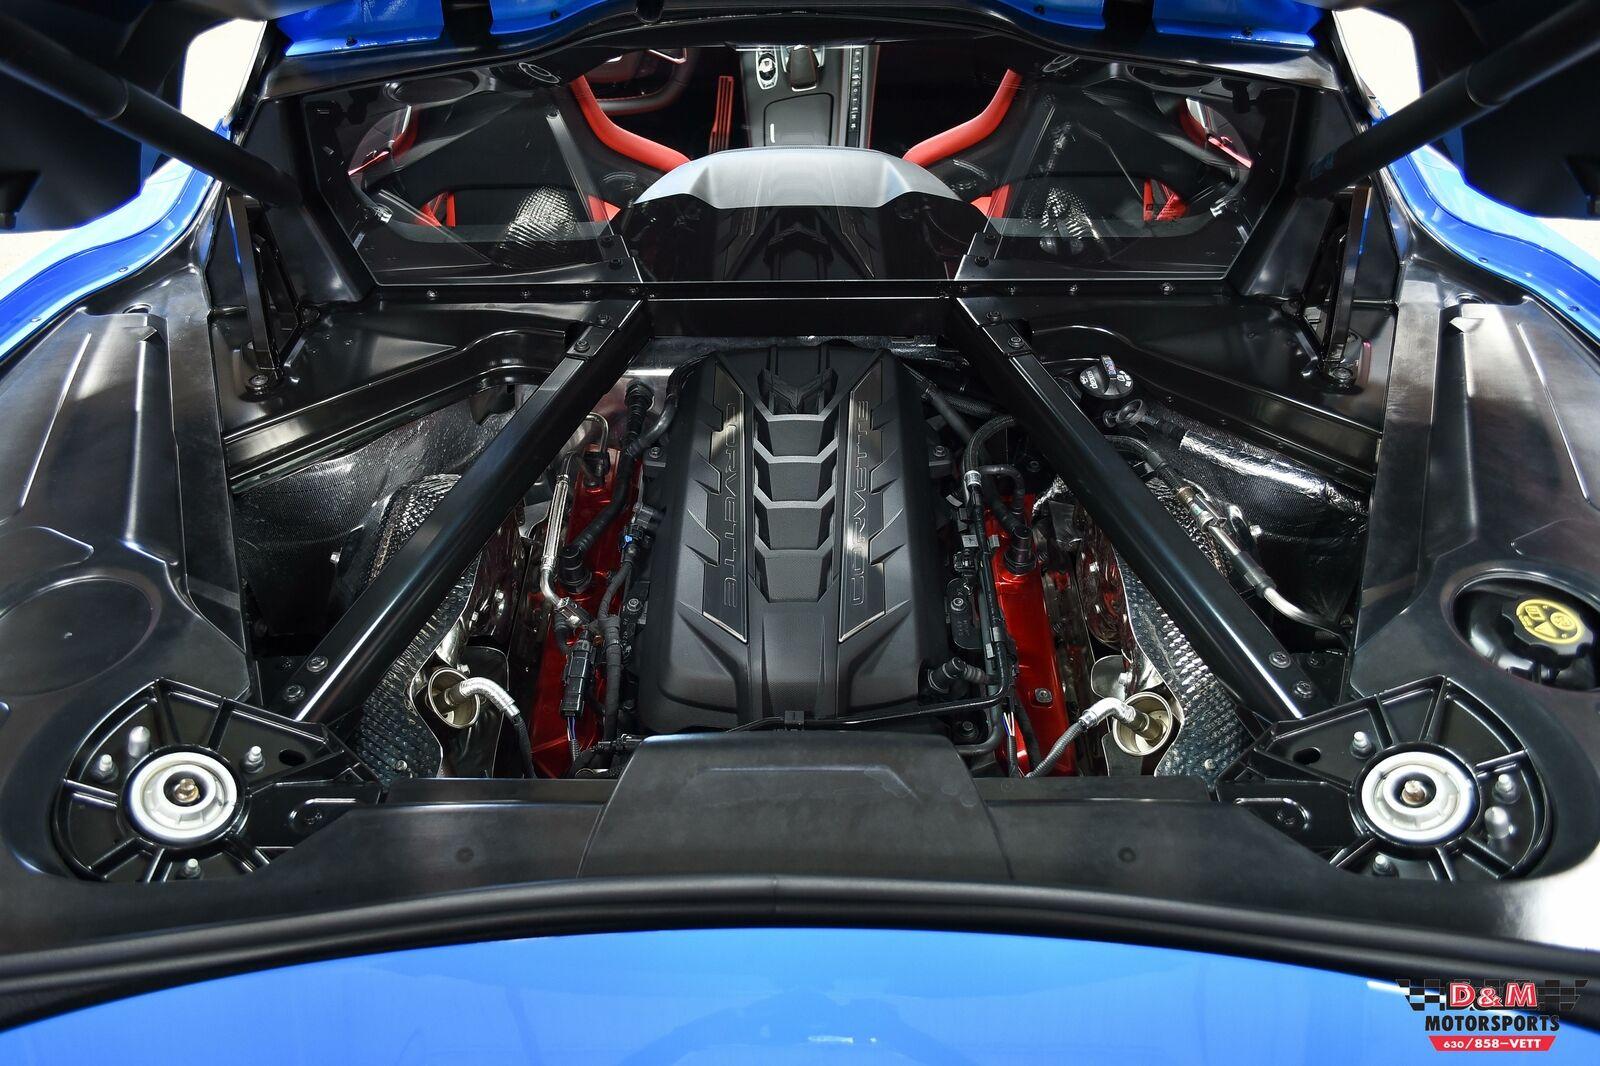 2020 Blue Chevrolet Corvette Stingray  | C7 Corvette Photo 5